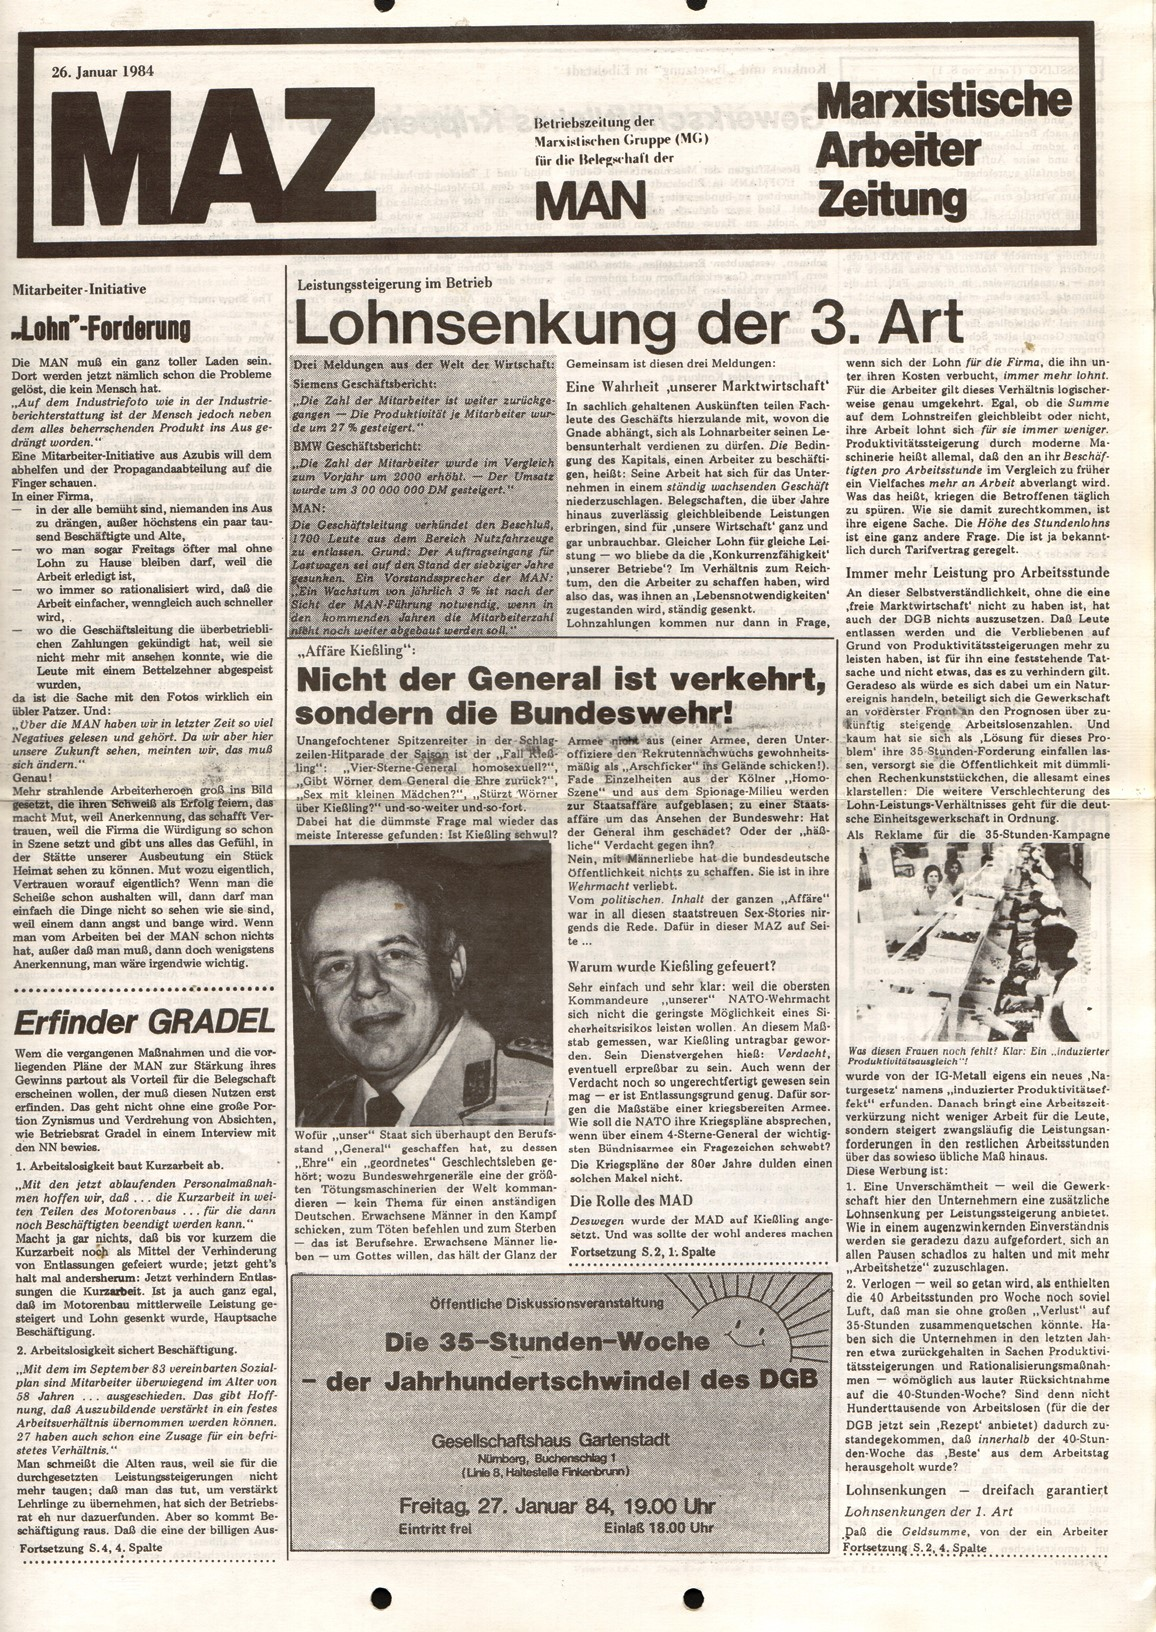 Nuernberg_MG_MAZ_MAN_19840126_01